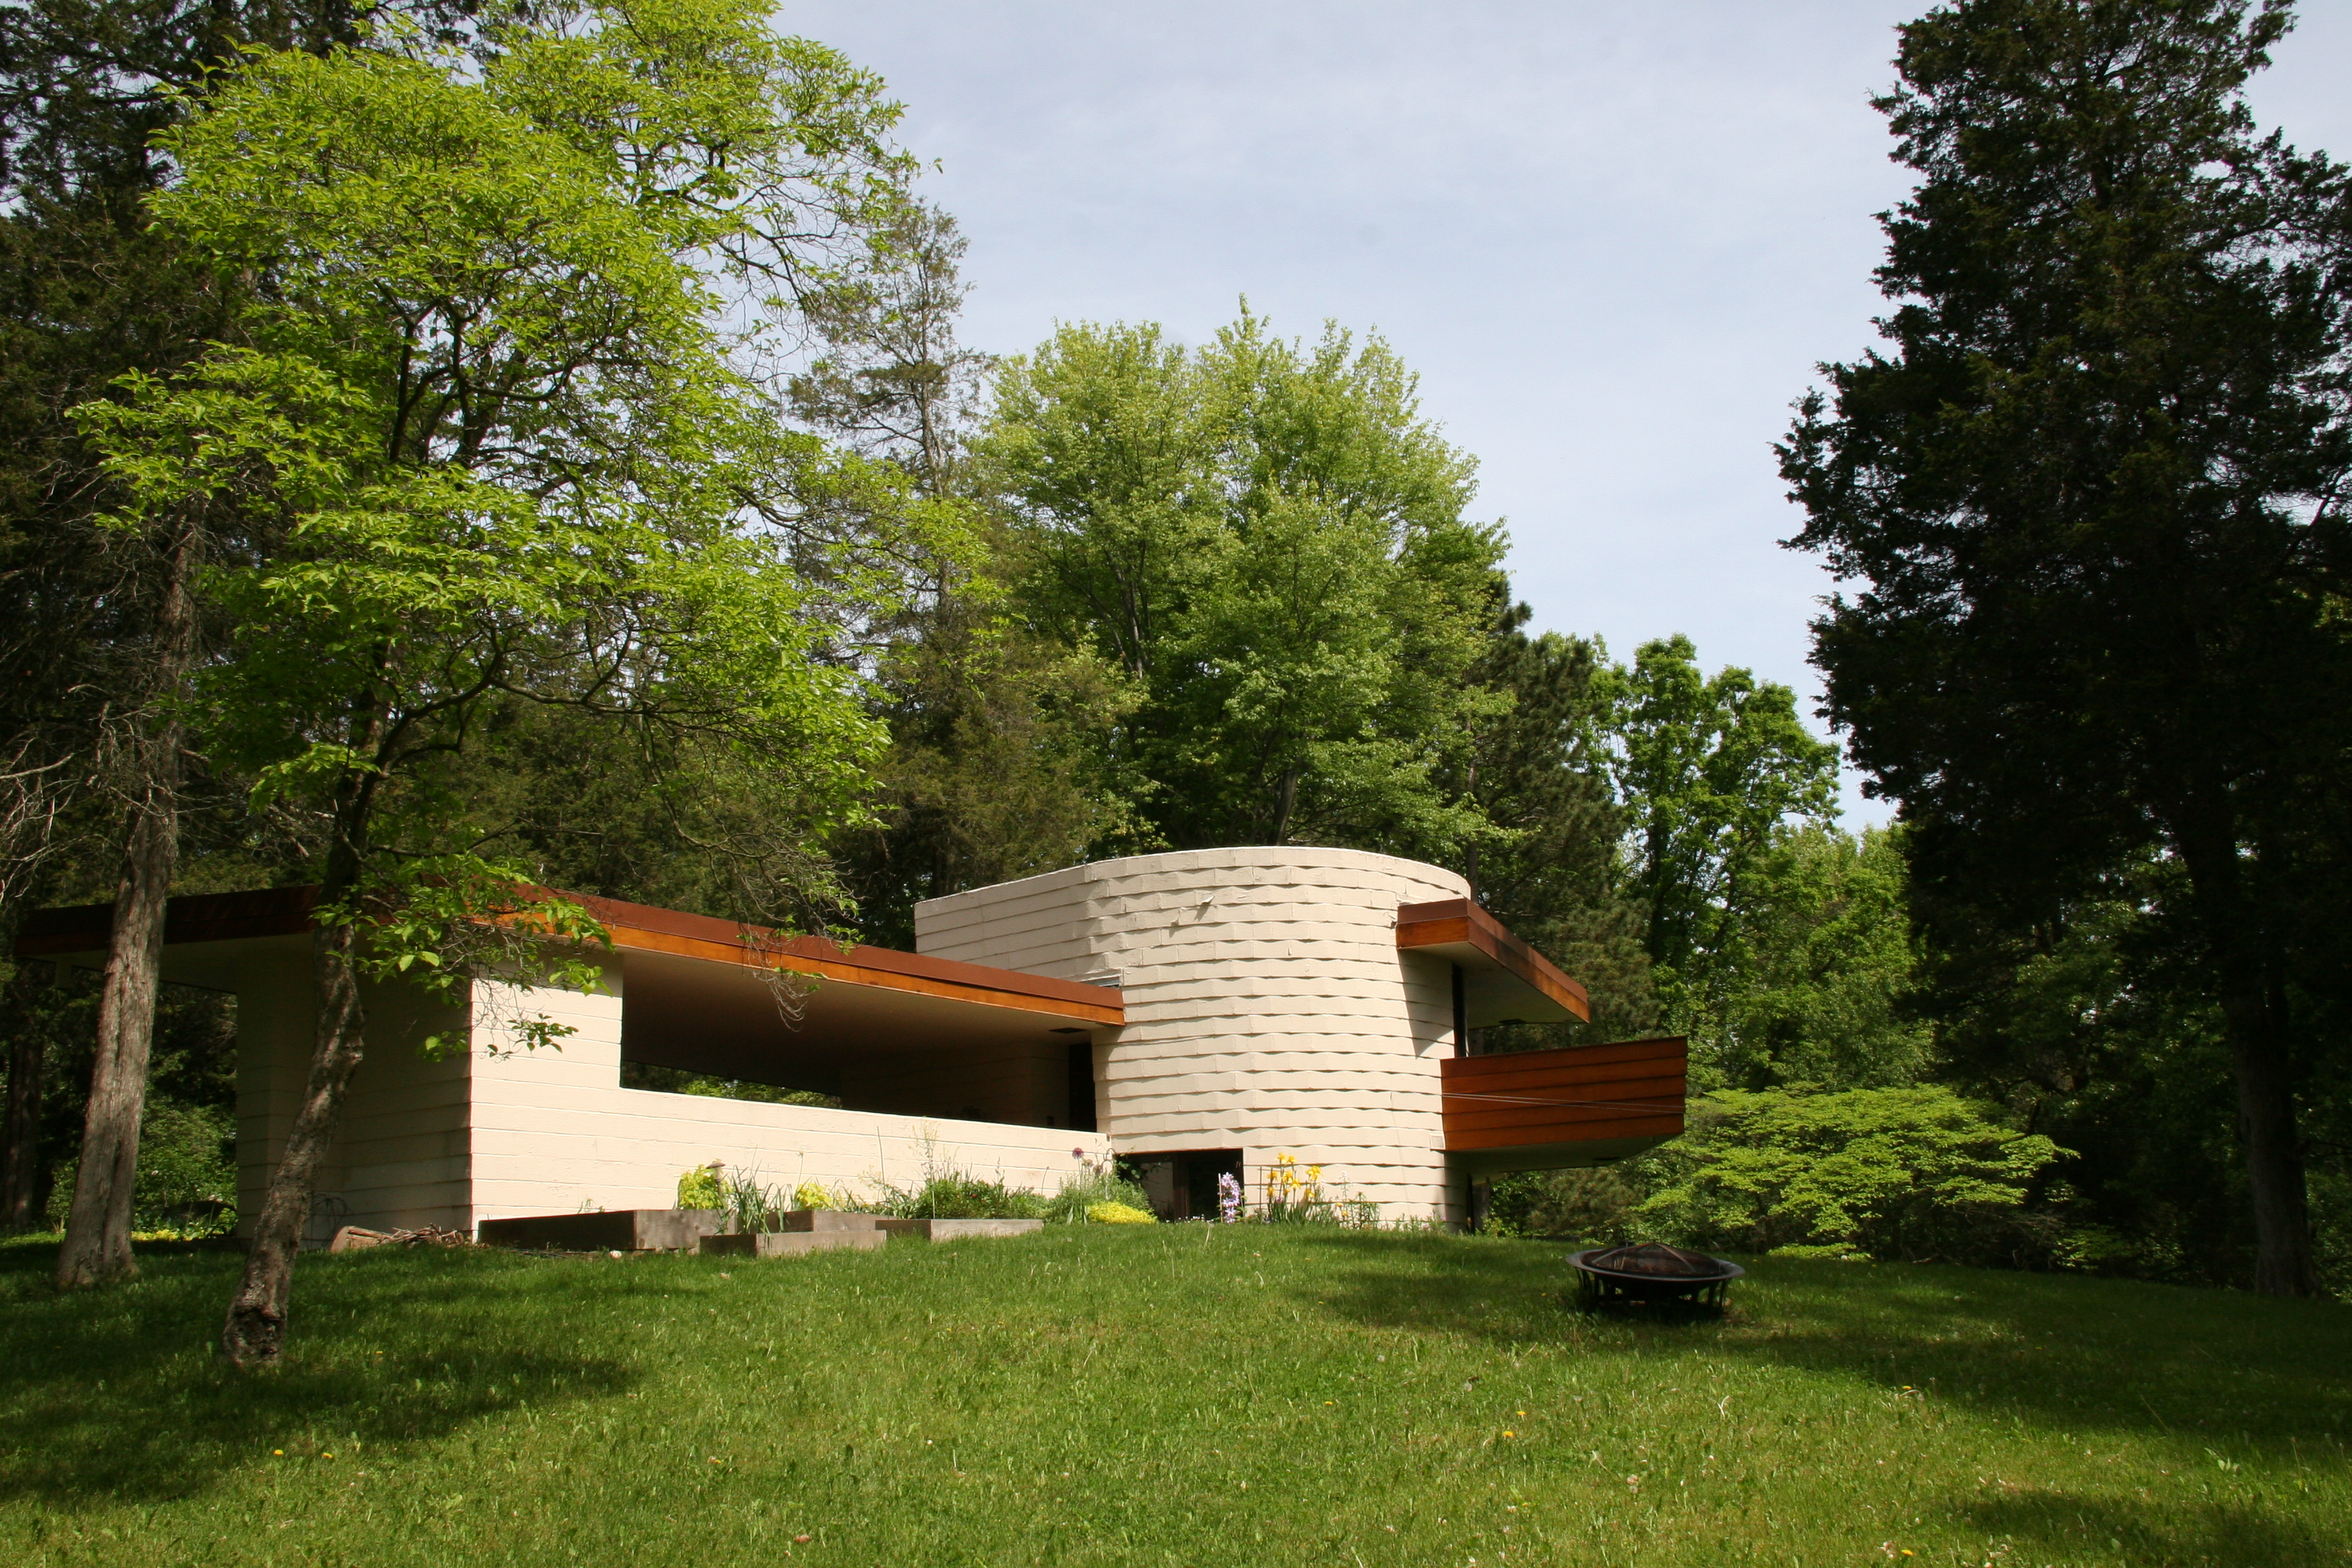 Aaa San Antonio >> Frank Lloyd Wright Designed These 8 Michigan Homes